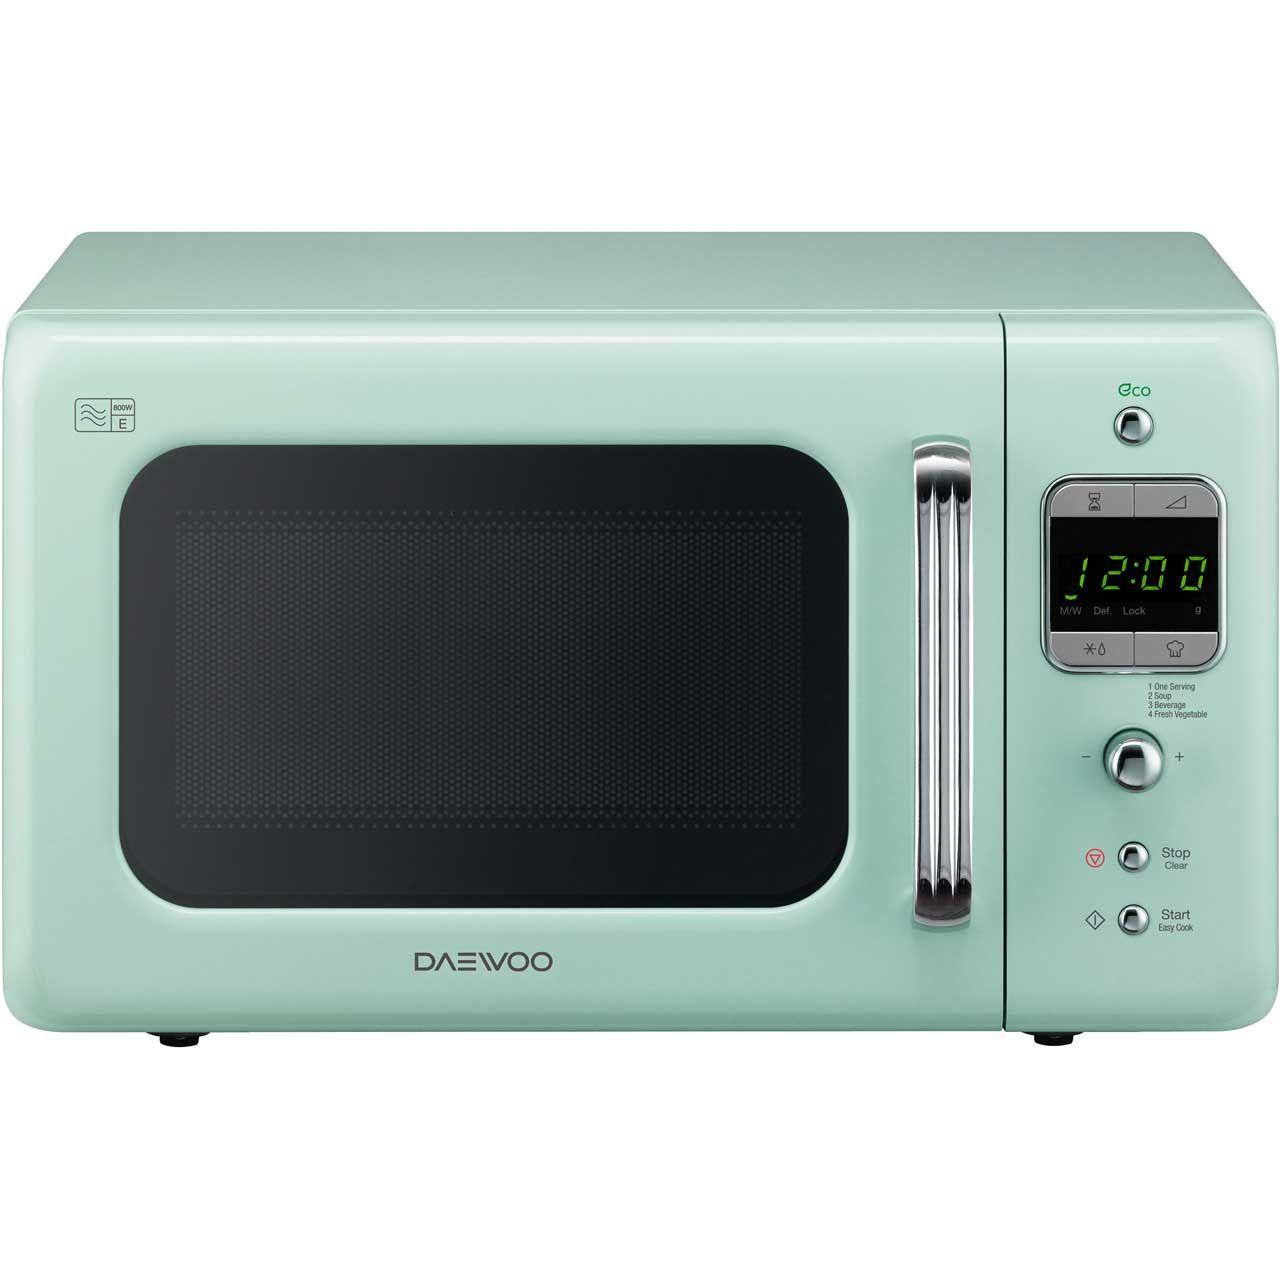 Daewoo Retro Style KOR7LBKM 20 Litre Microwave | Microwave oven ...